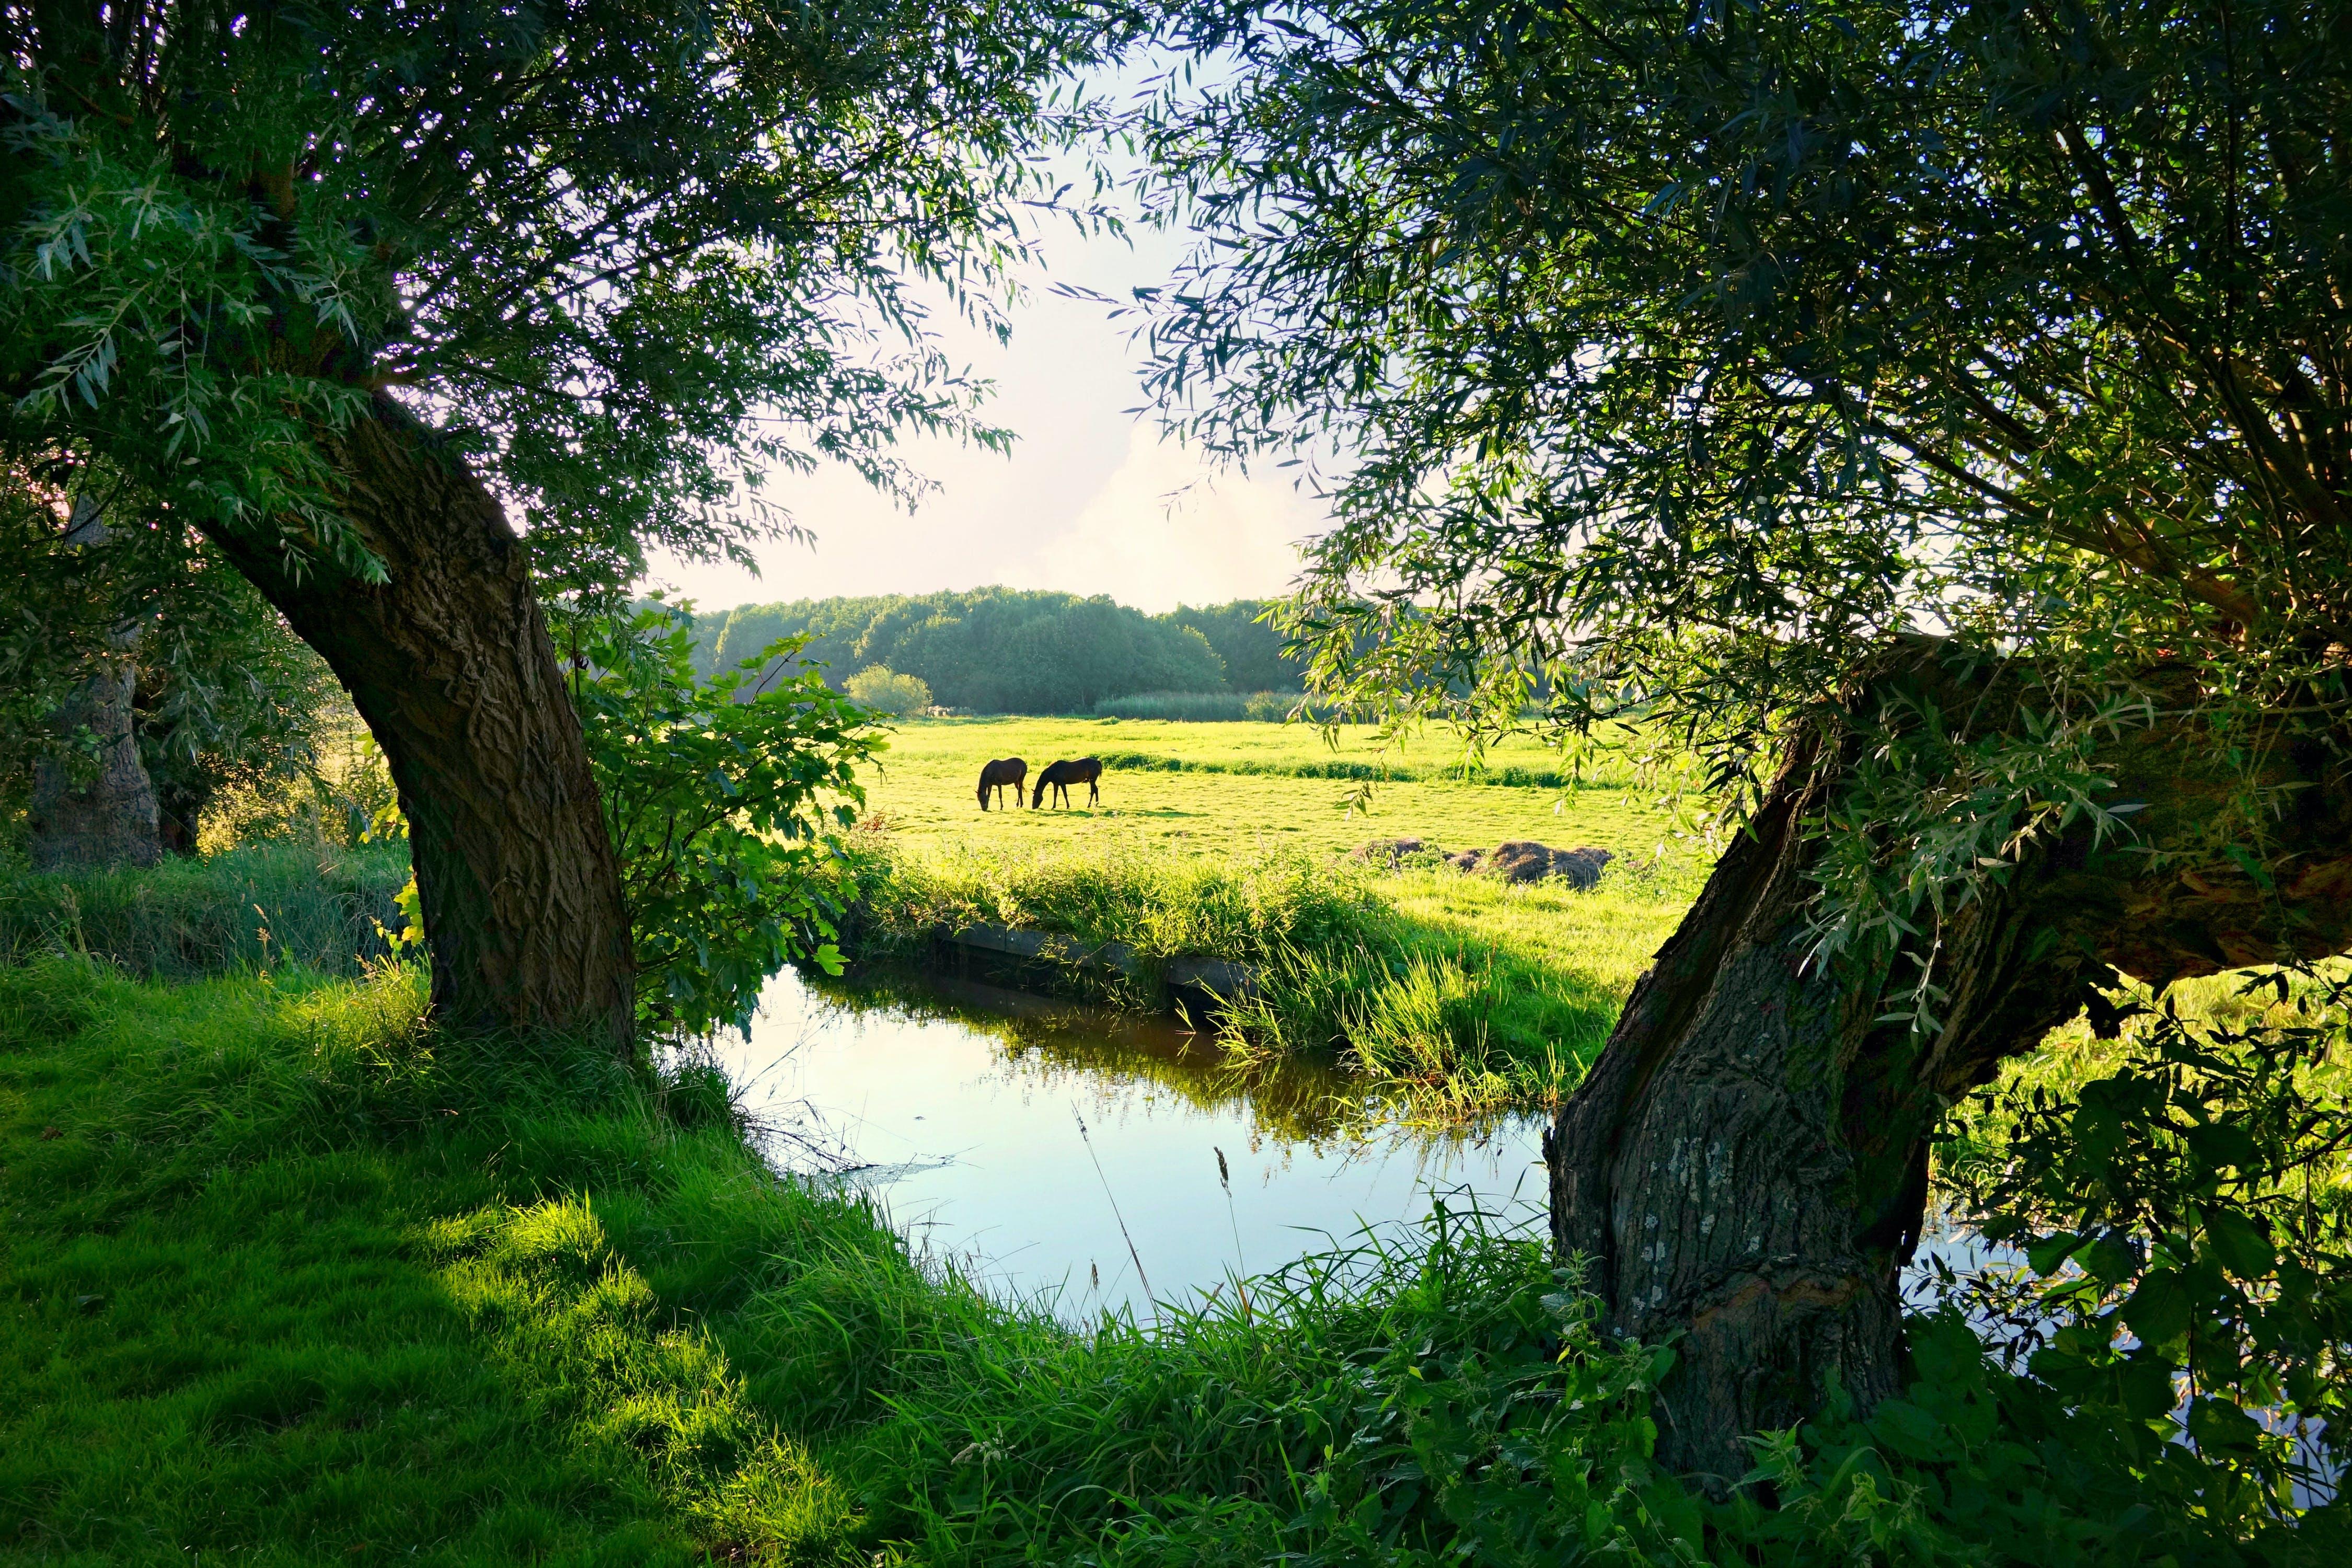 Grazing Animals Near Creek and Trees